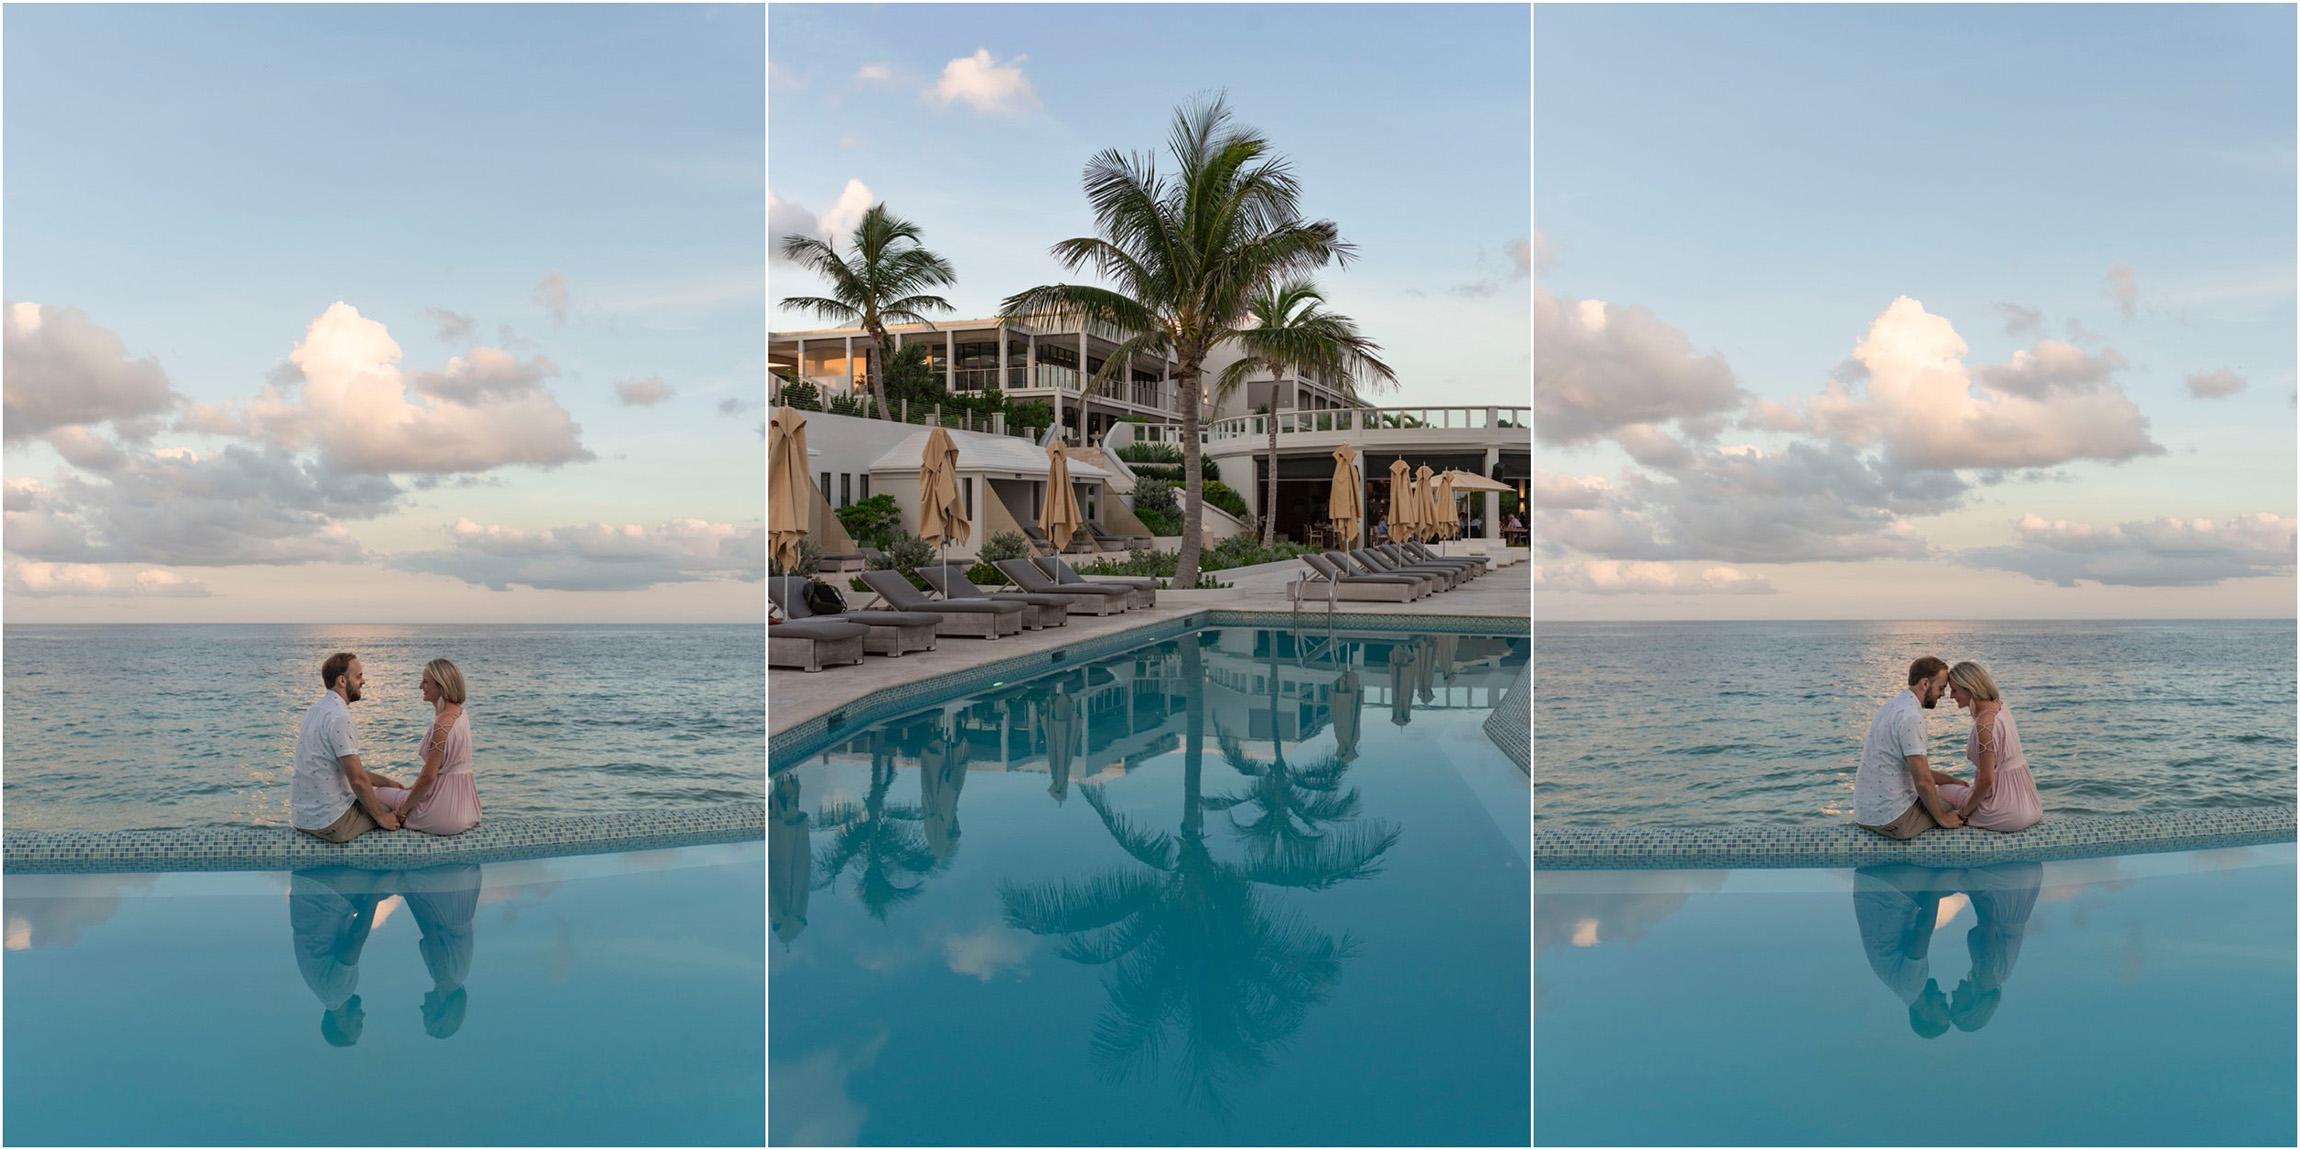 ©FianderFoto_Bermuda_Tom Moore's Jungle_Proposal Maternity Photographer_Erika_Andy_032.jpg